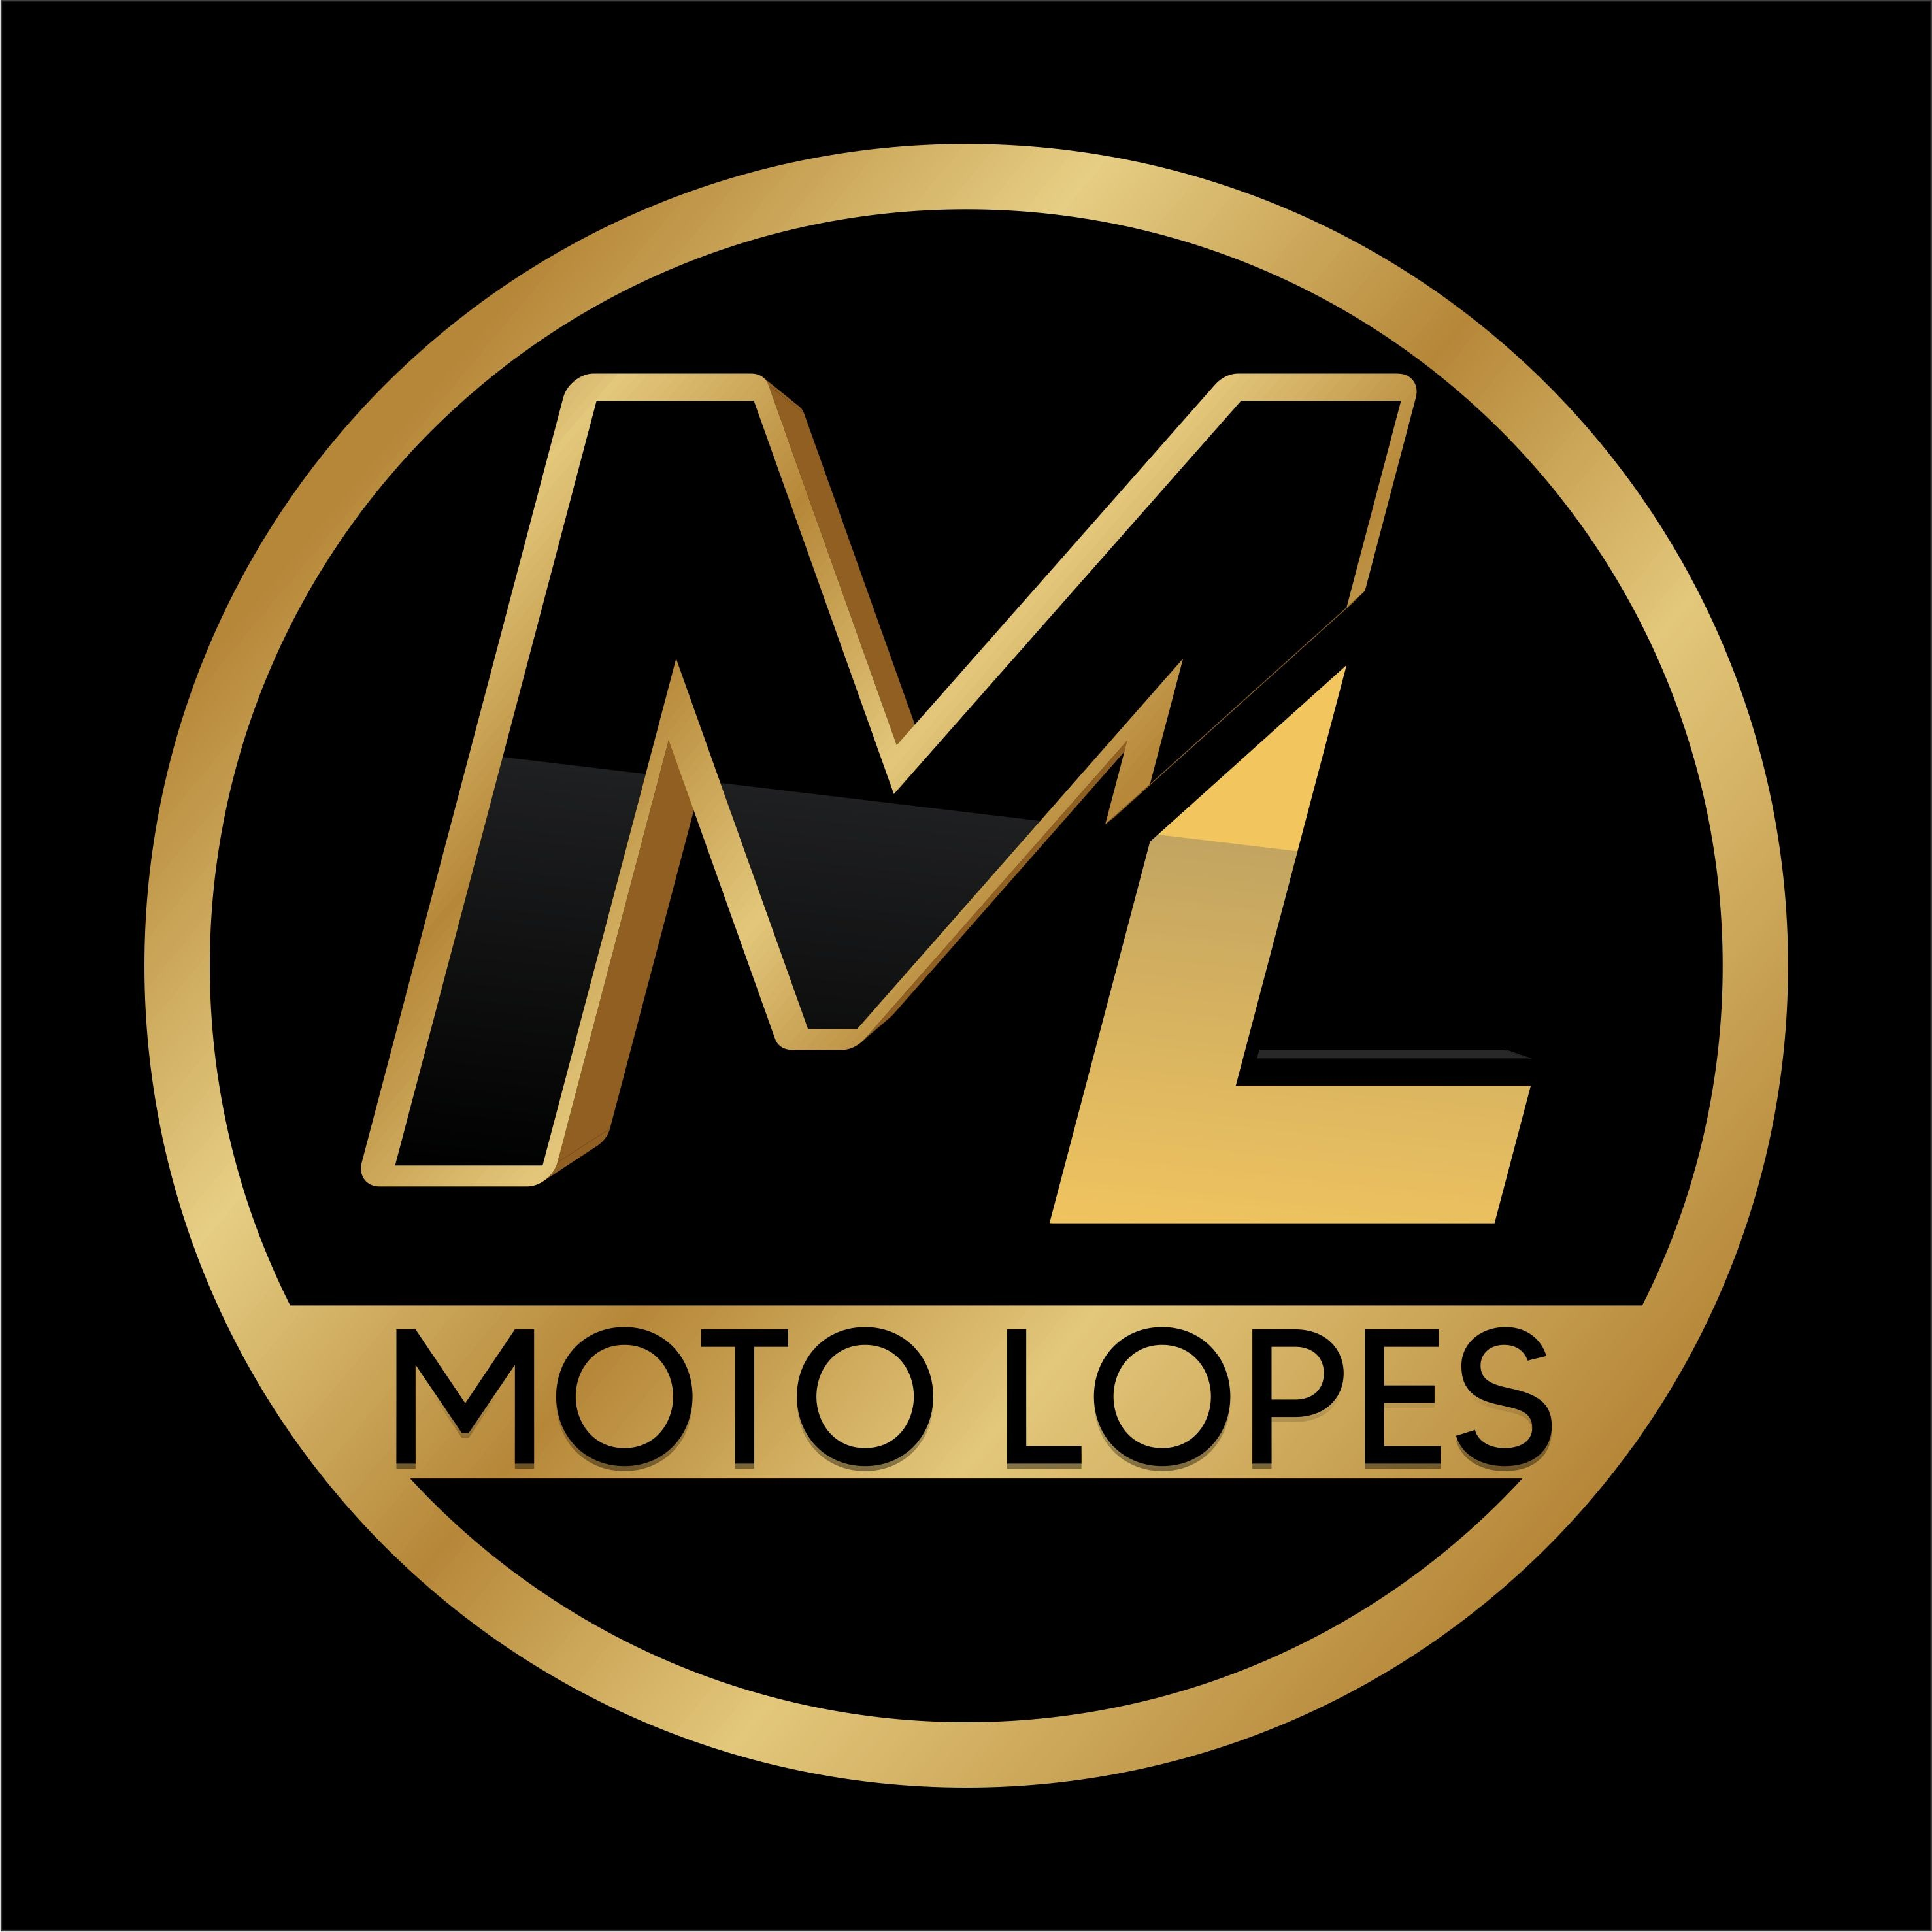 MOTO LOPES